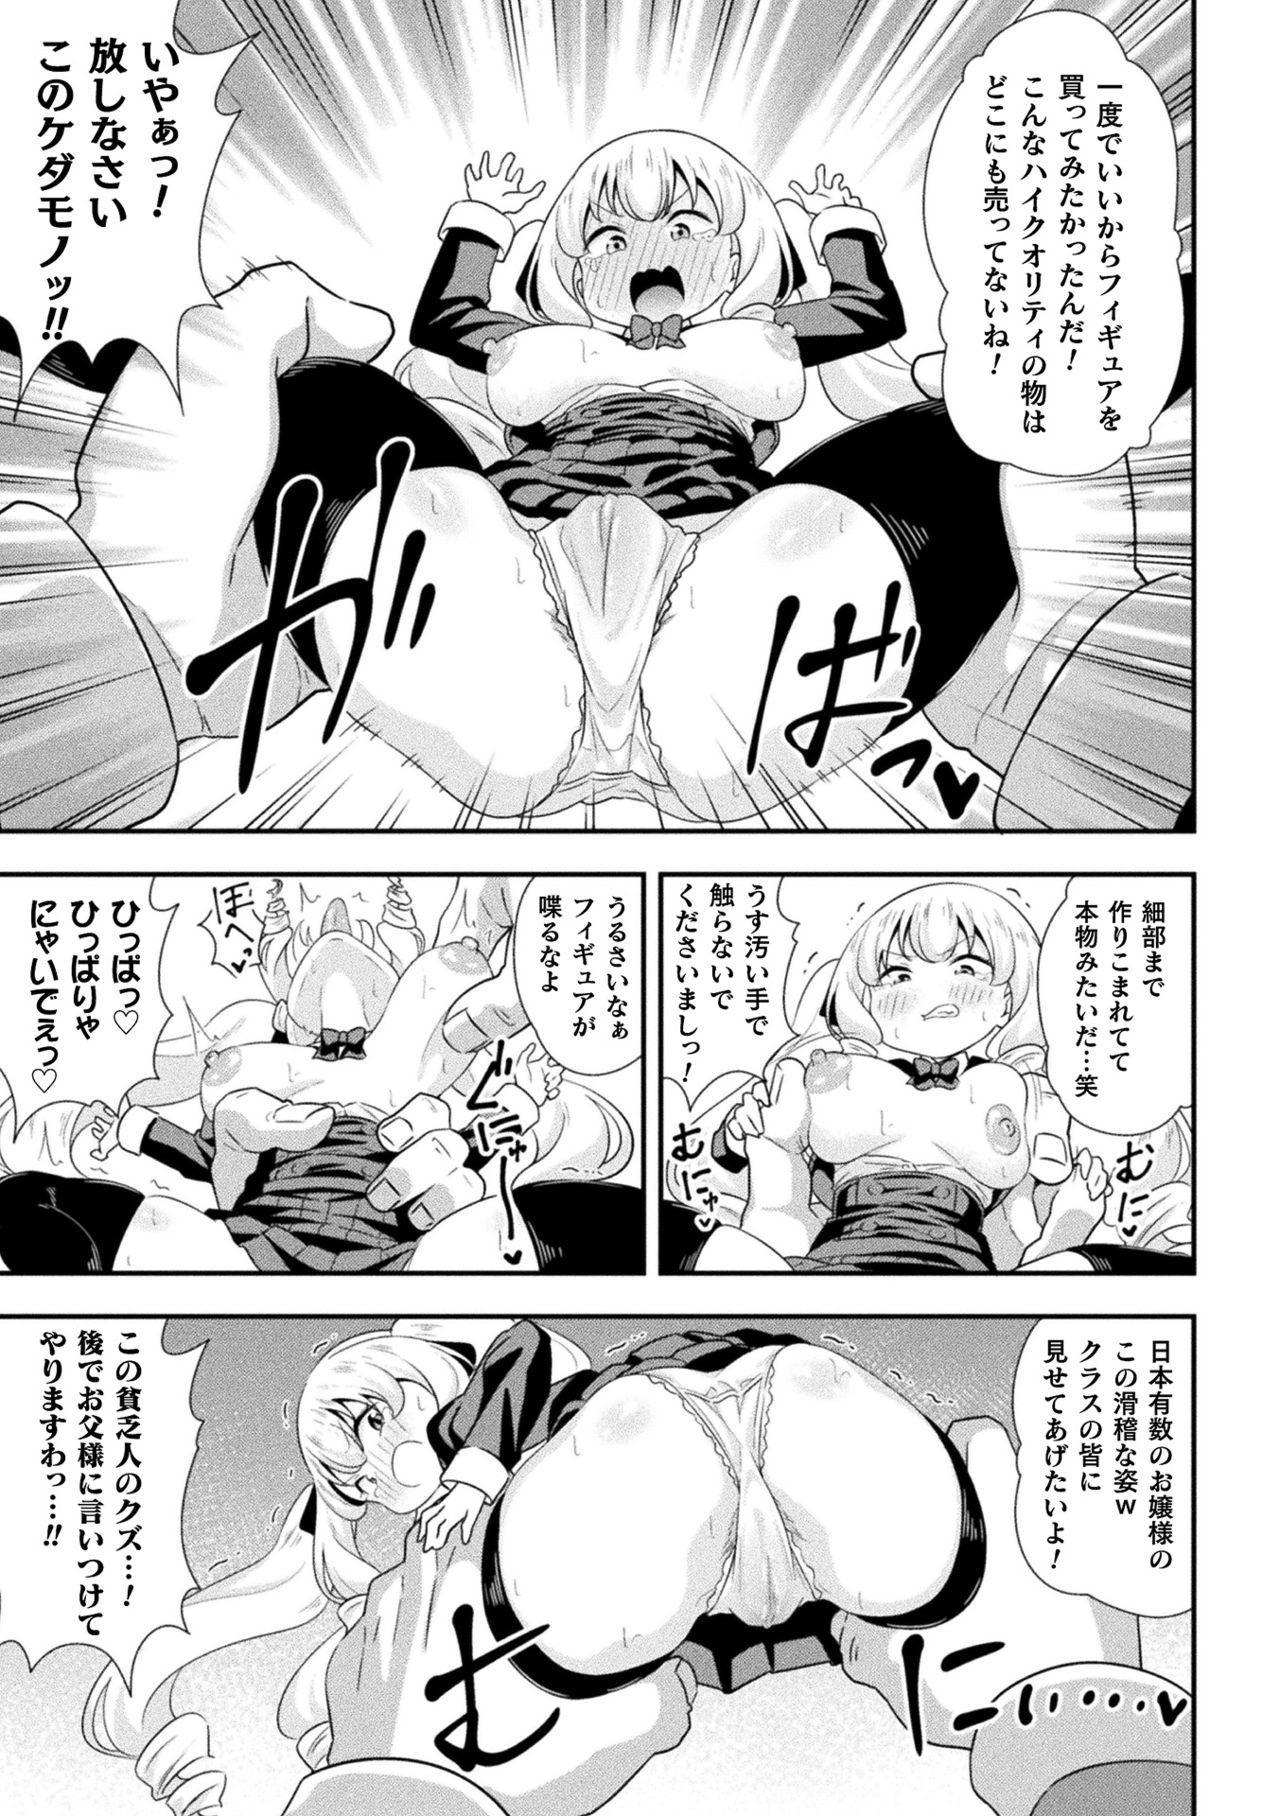 2D Comic Magazine - Syukusyouka Hiroin Kyousei Onahole Keikaku Vol. 2 6